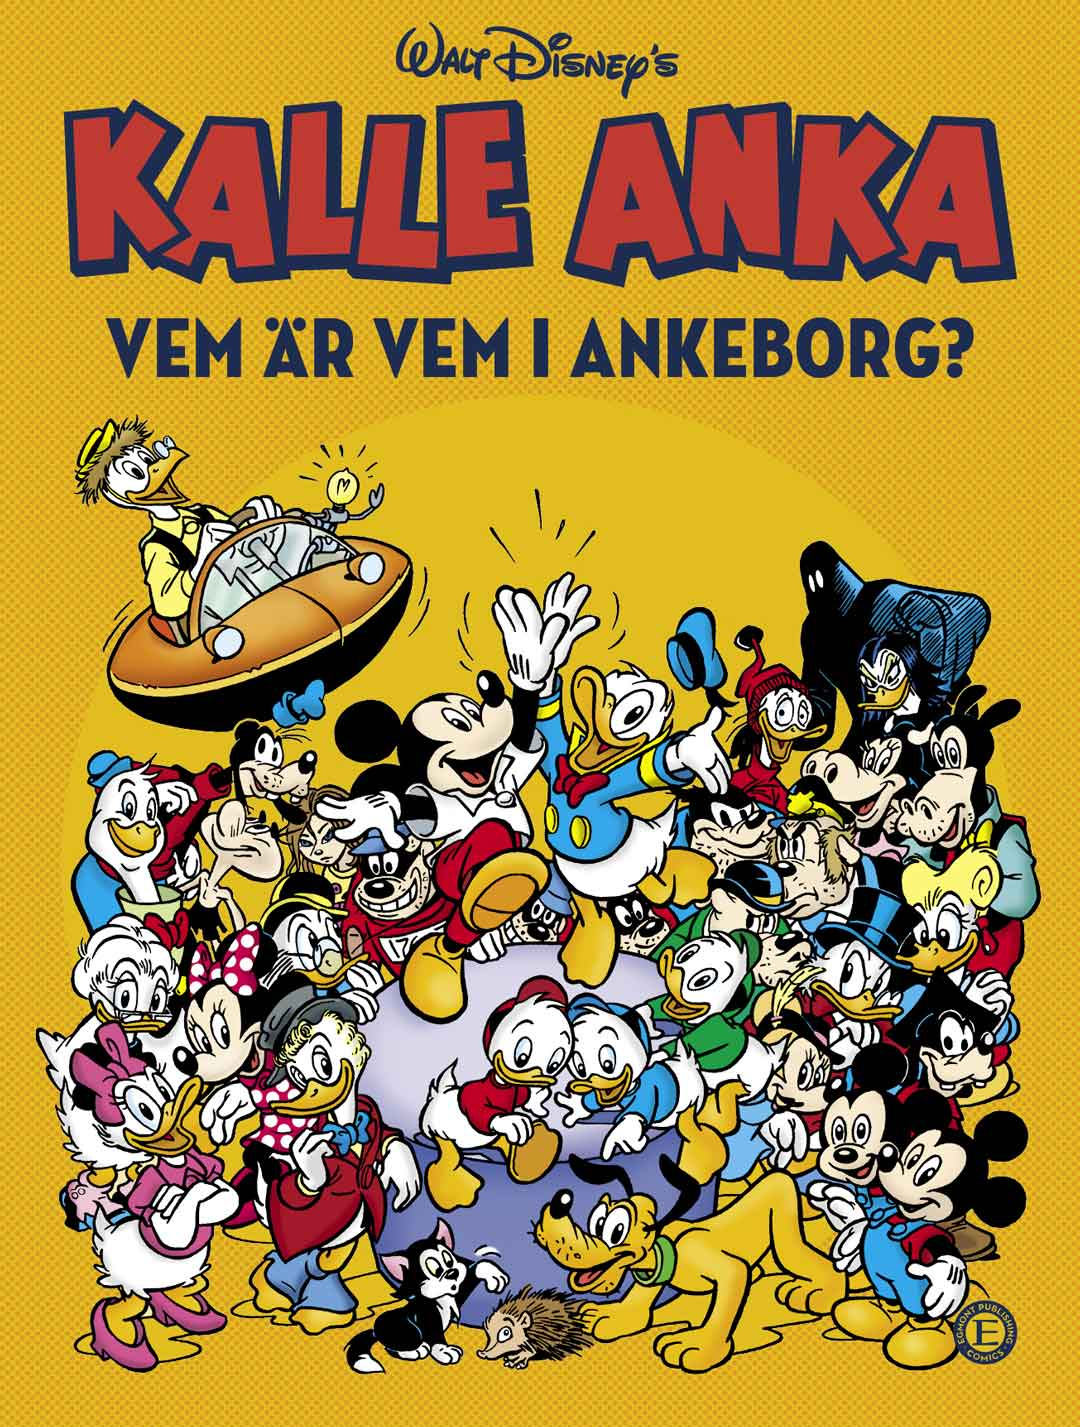 Kalle Anka: Vem är vem i Ankeborg?